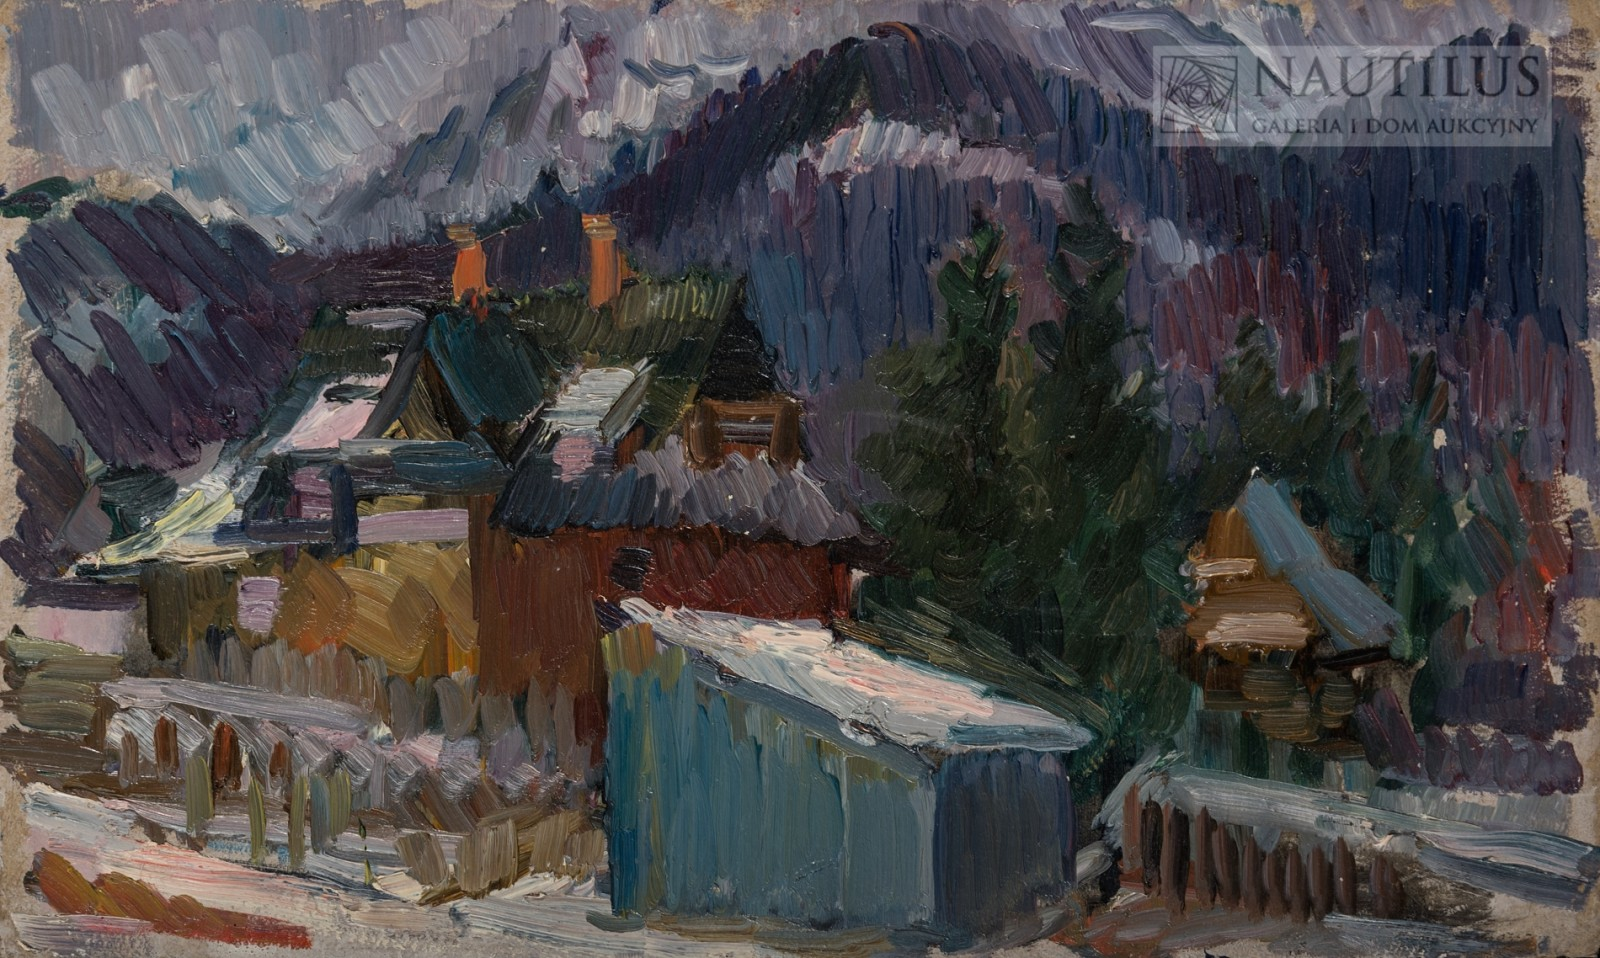 Pejzaż z górskimi chatami